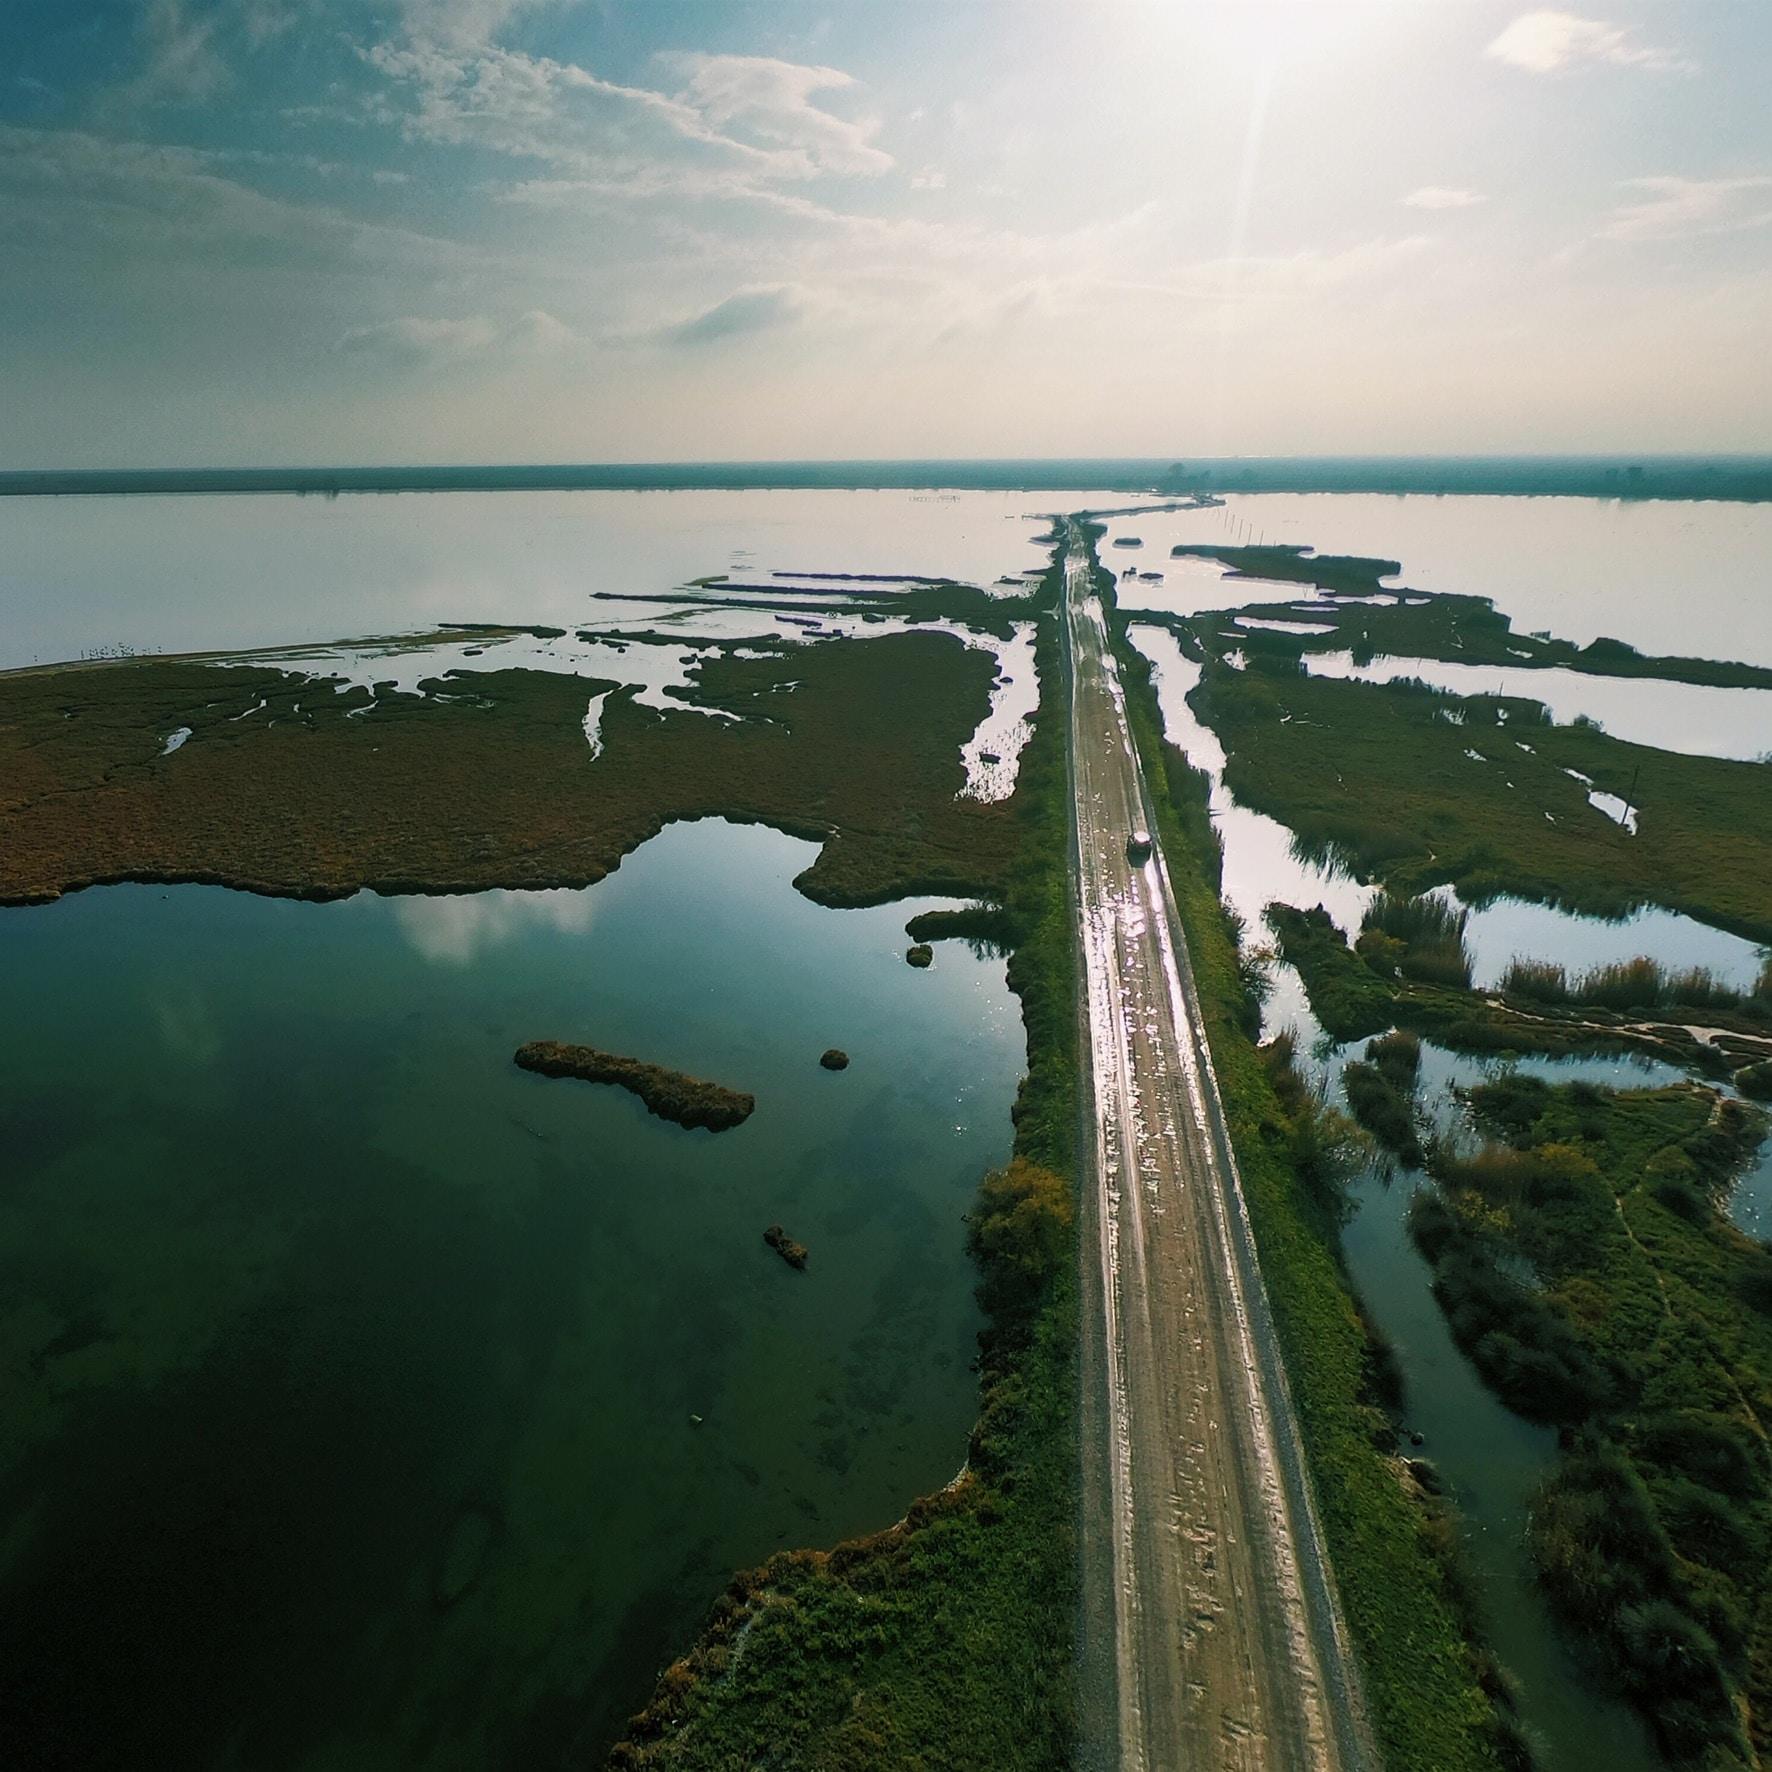 aerial photography of asphalt road in between body of water